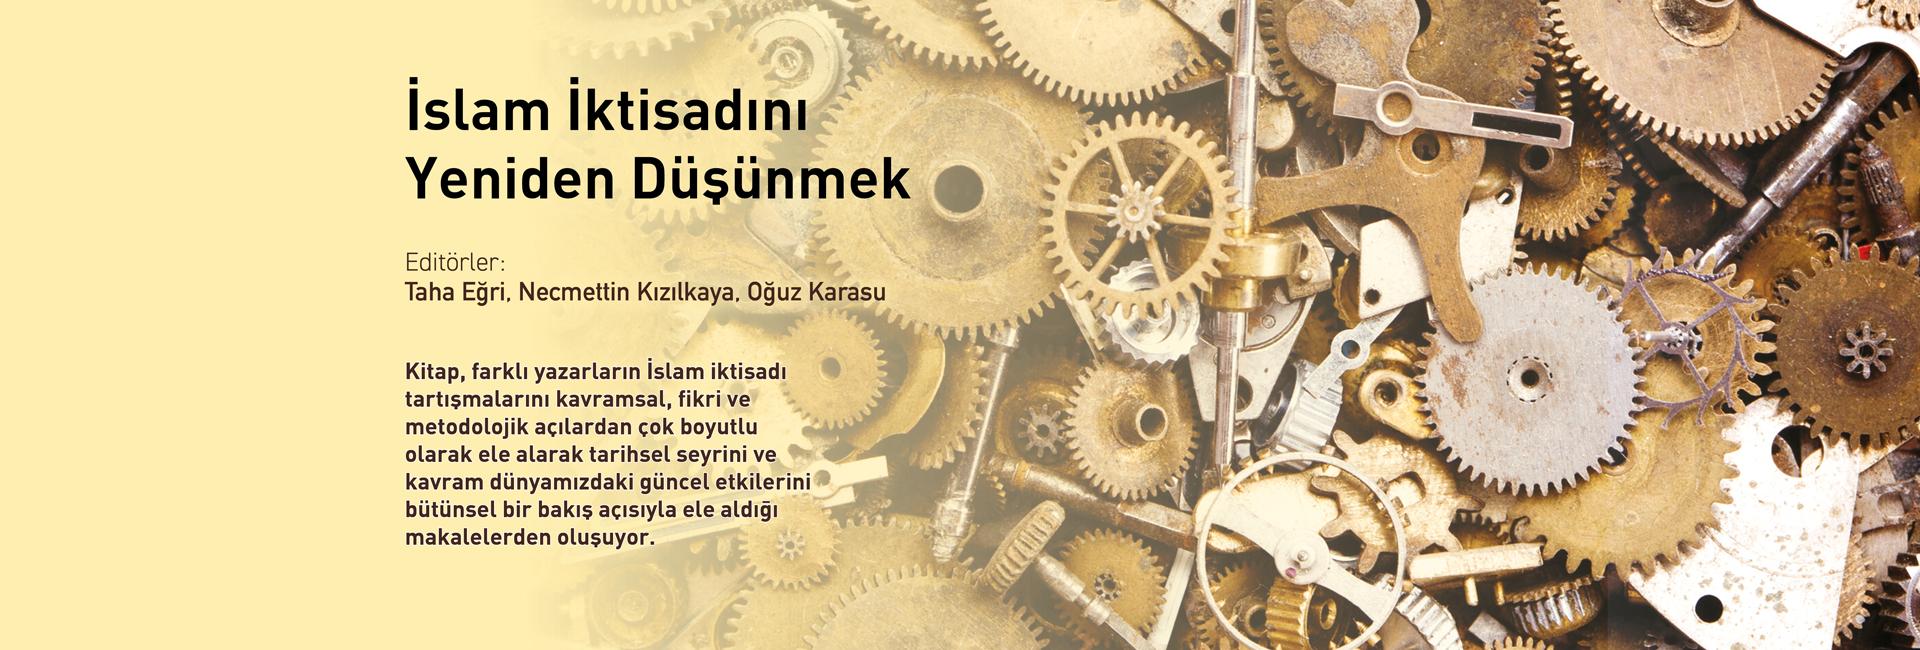 http://iktisatyayinlari.com/content/1-home/iktisaty_web9.jpg